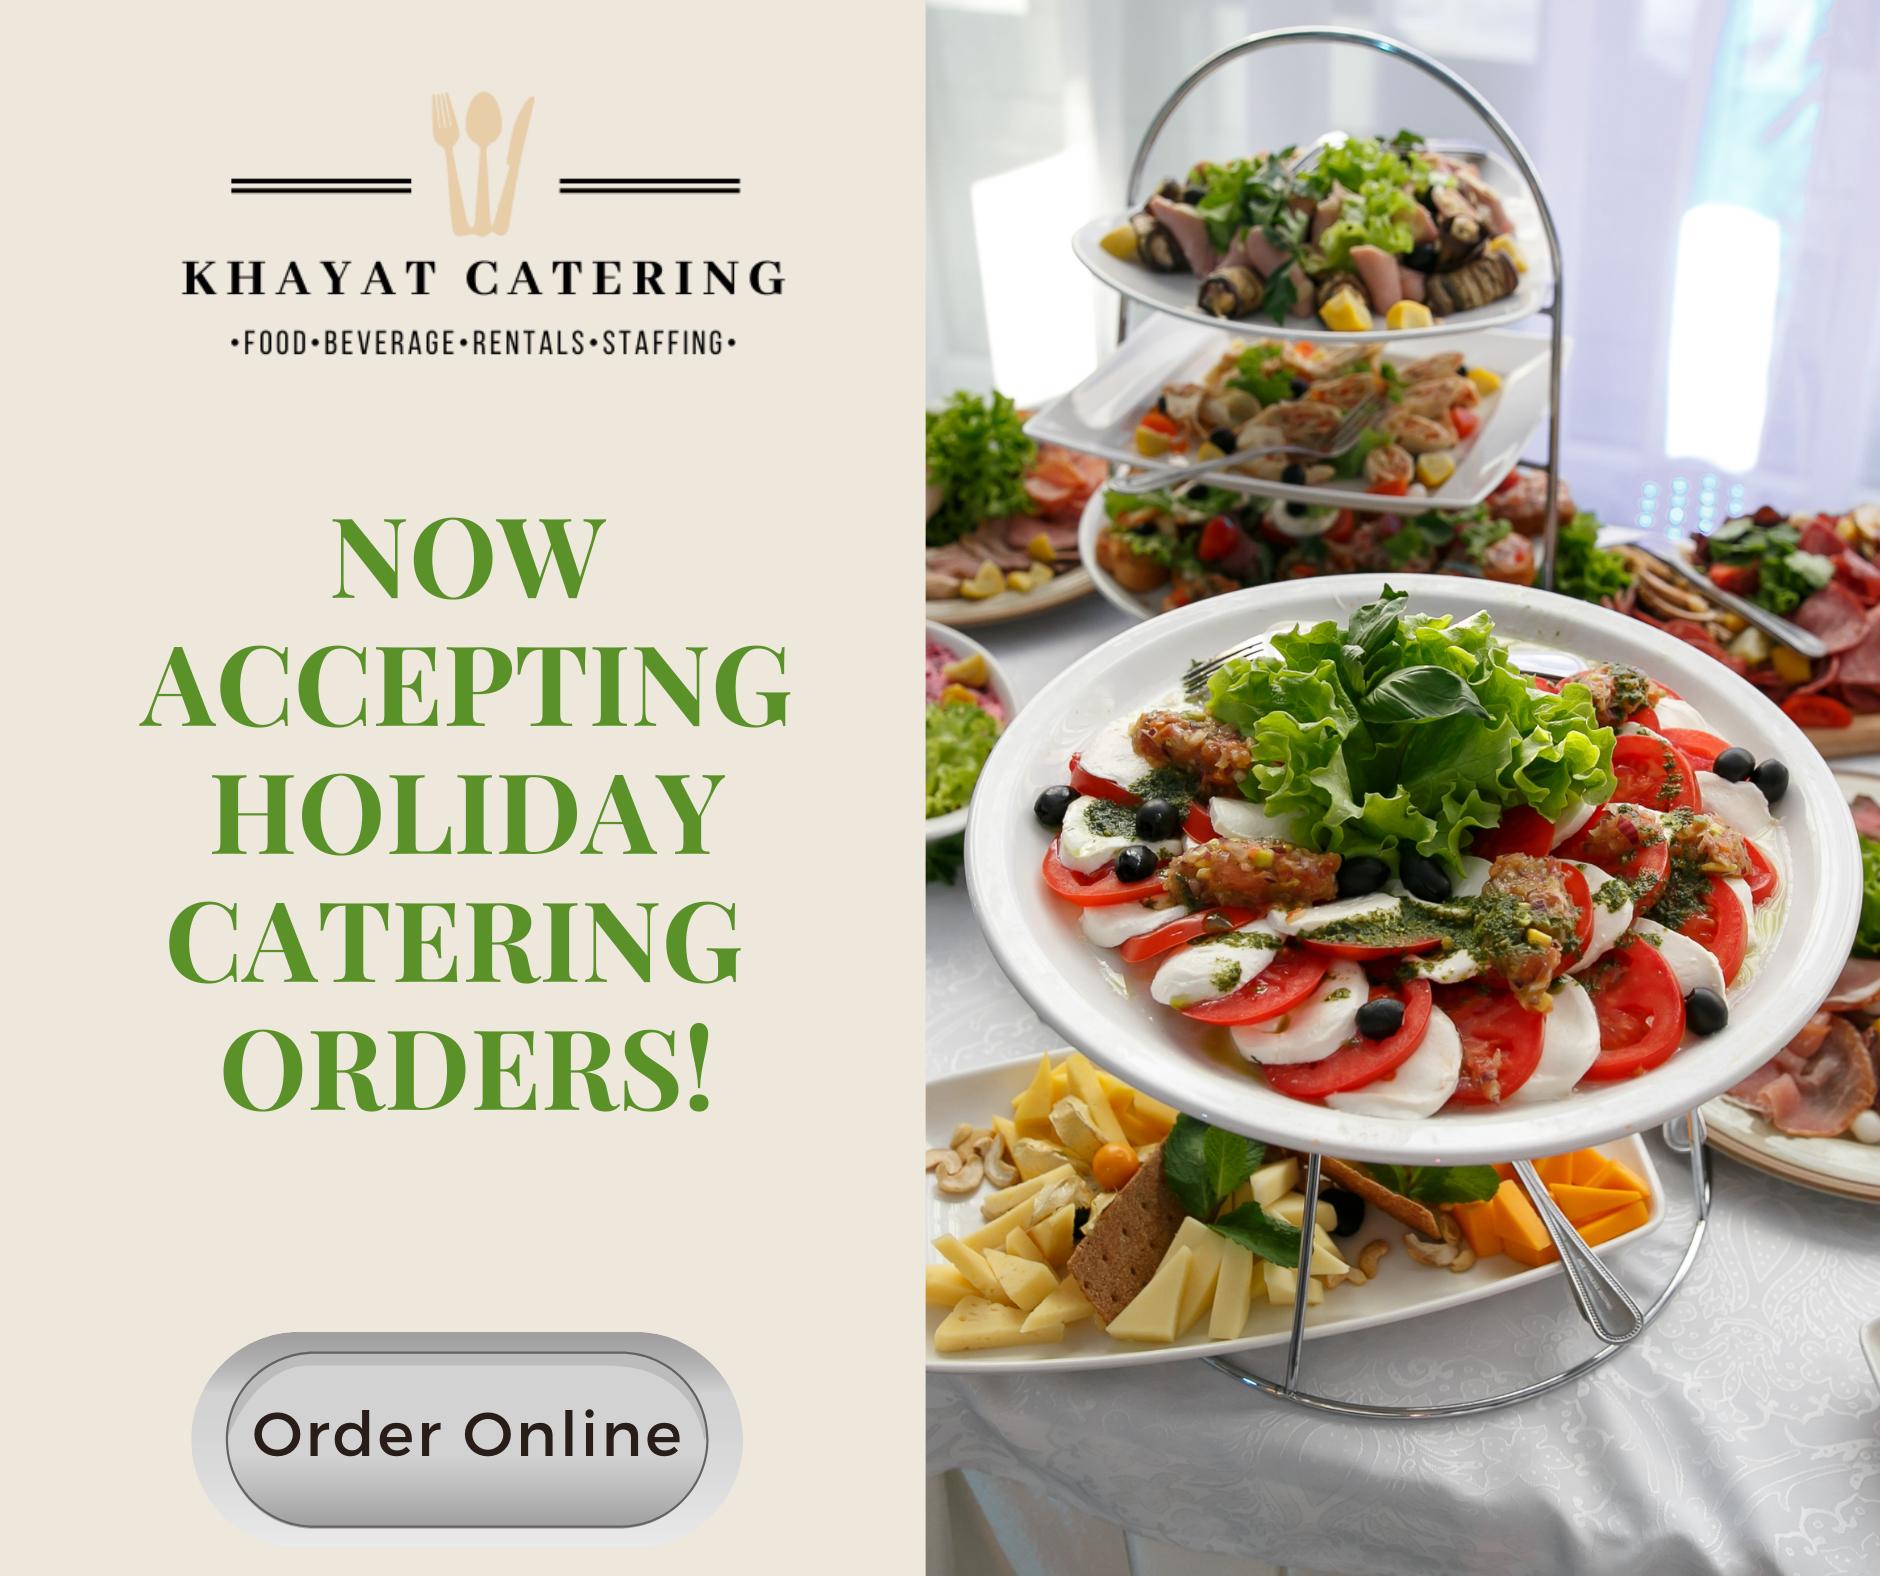 Khayat Catering Order Online